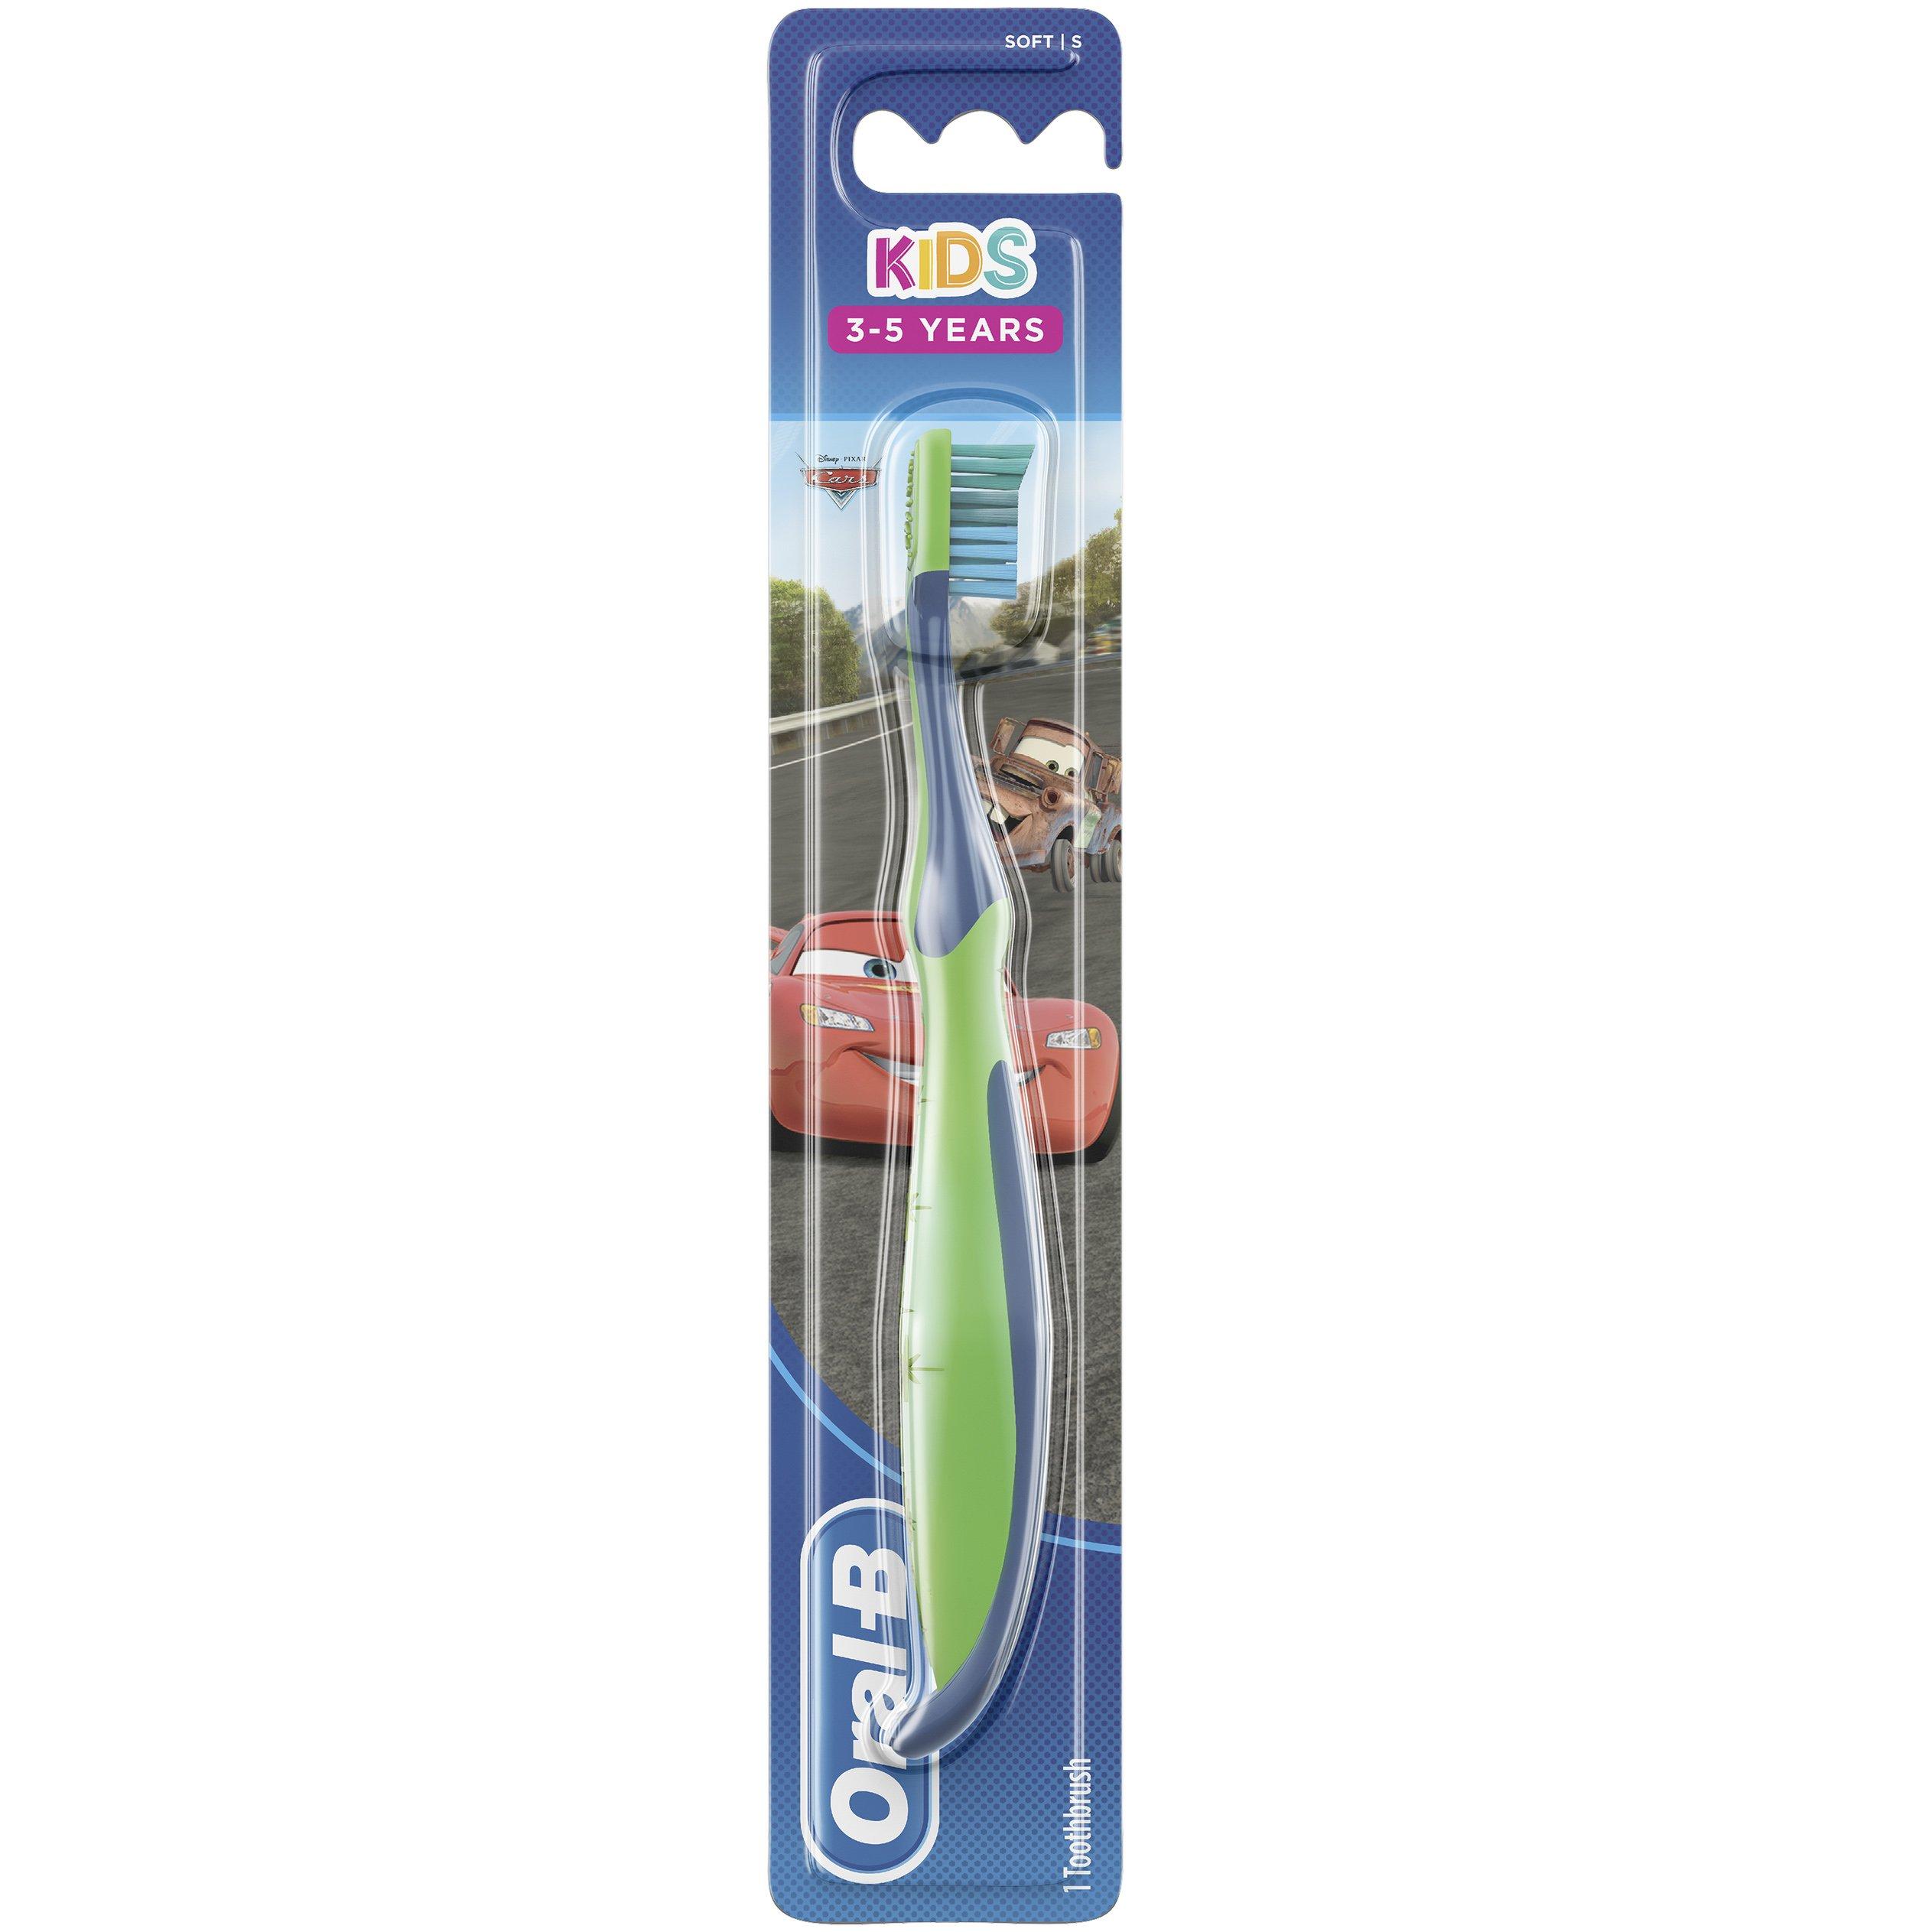 Oral-B Kids Cars Χειροκίνητη Παιδική Οδοντόβουρτσα Soft, 3-5 Ετών 1 Τεμάχιο – μπλέ